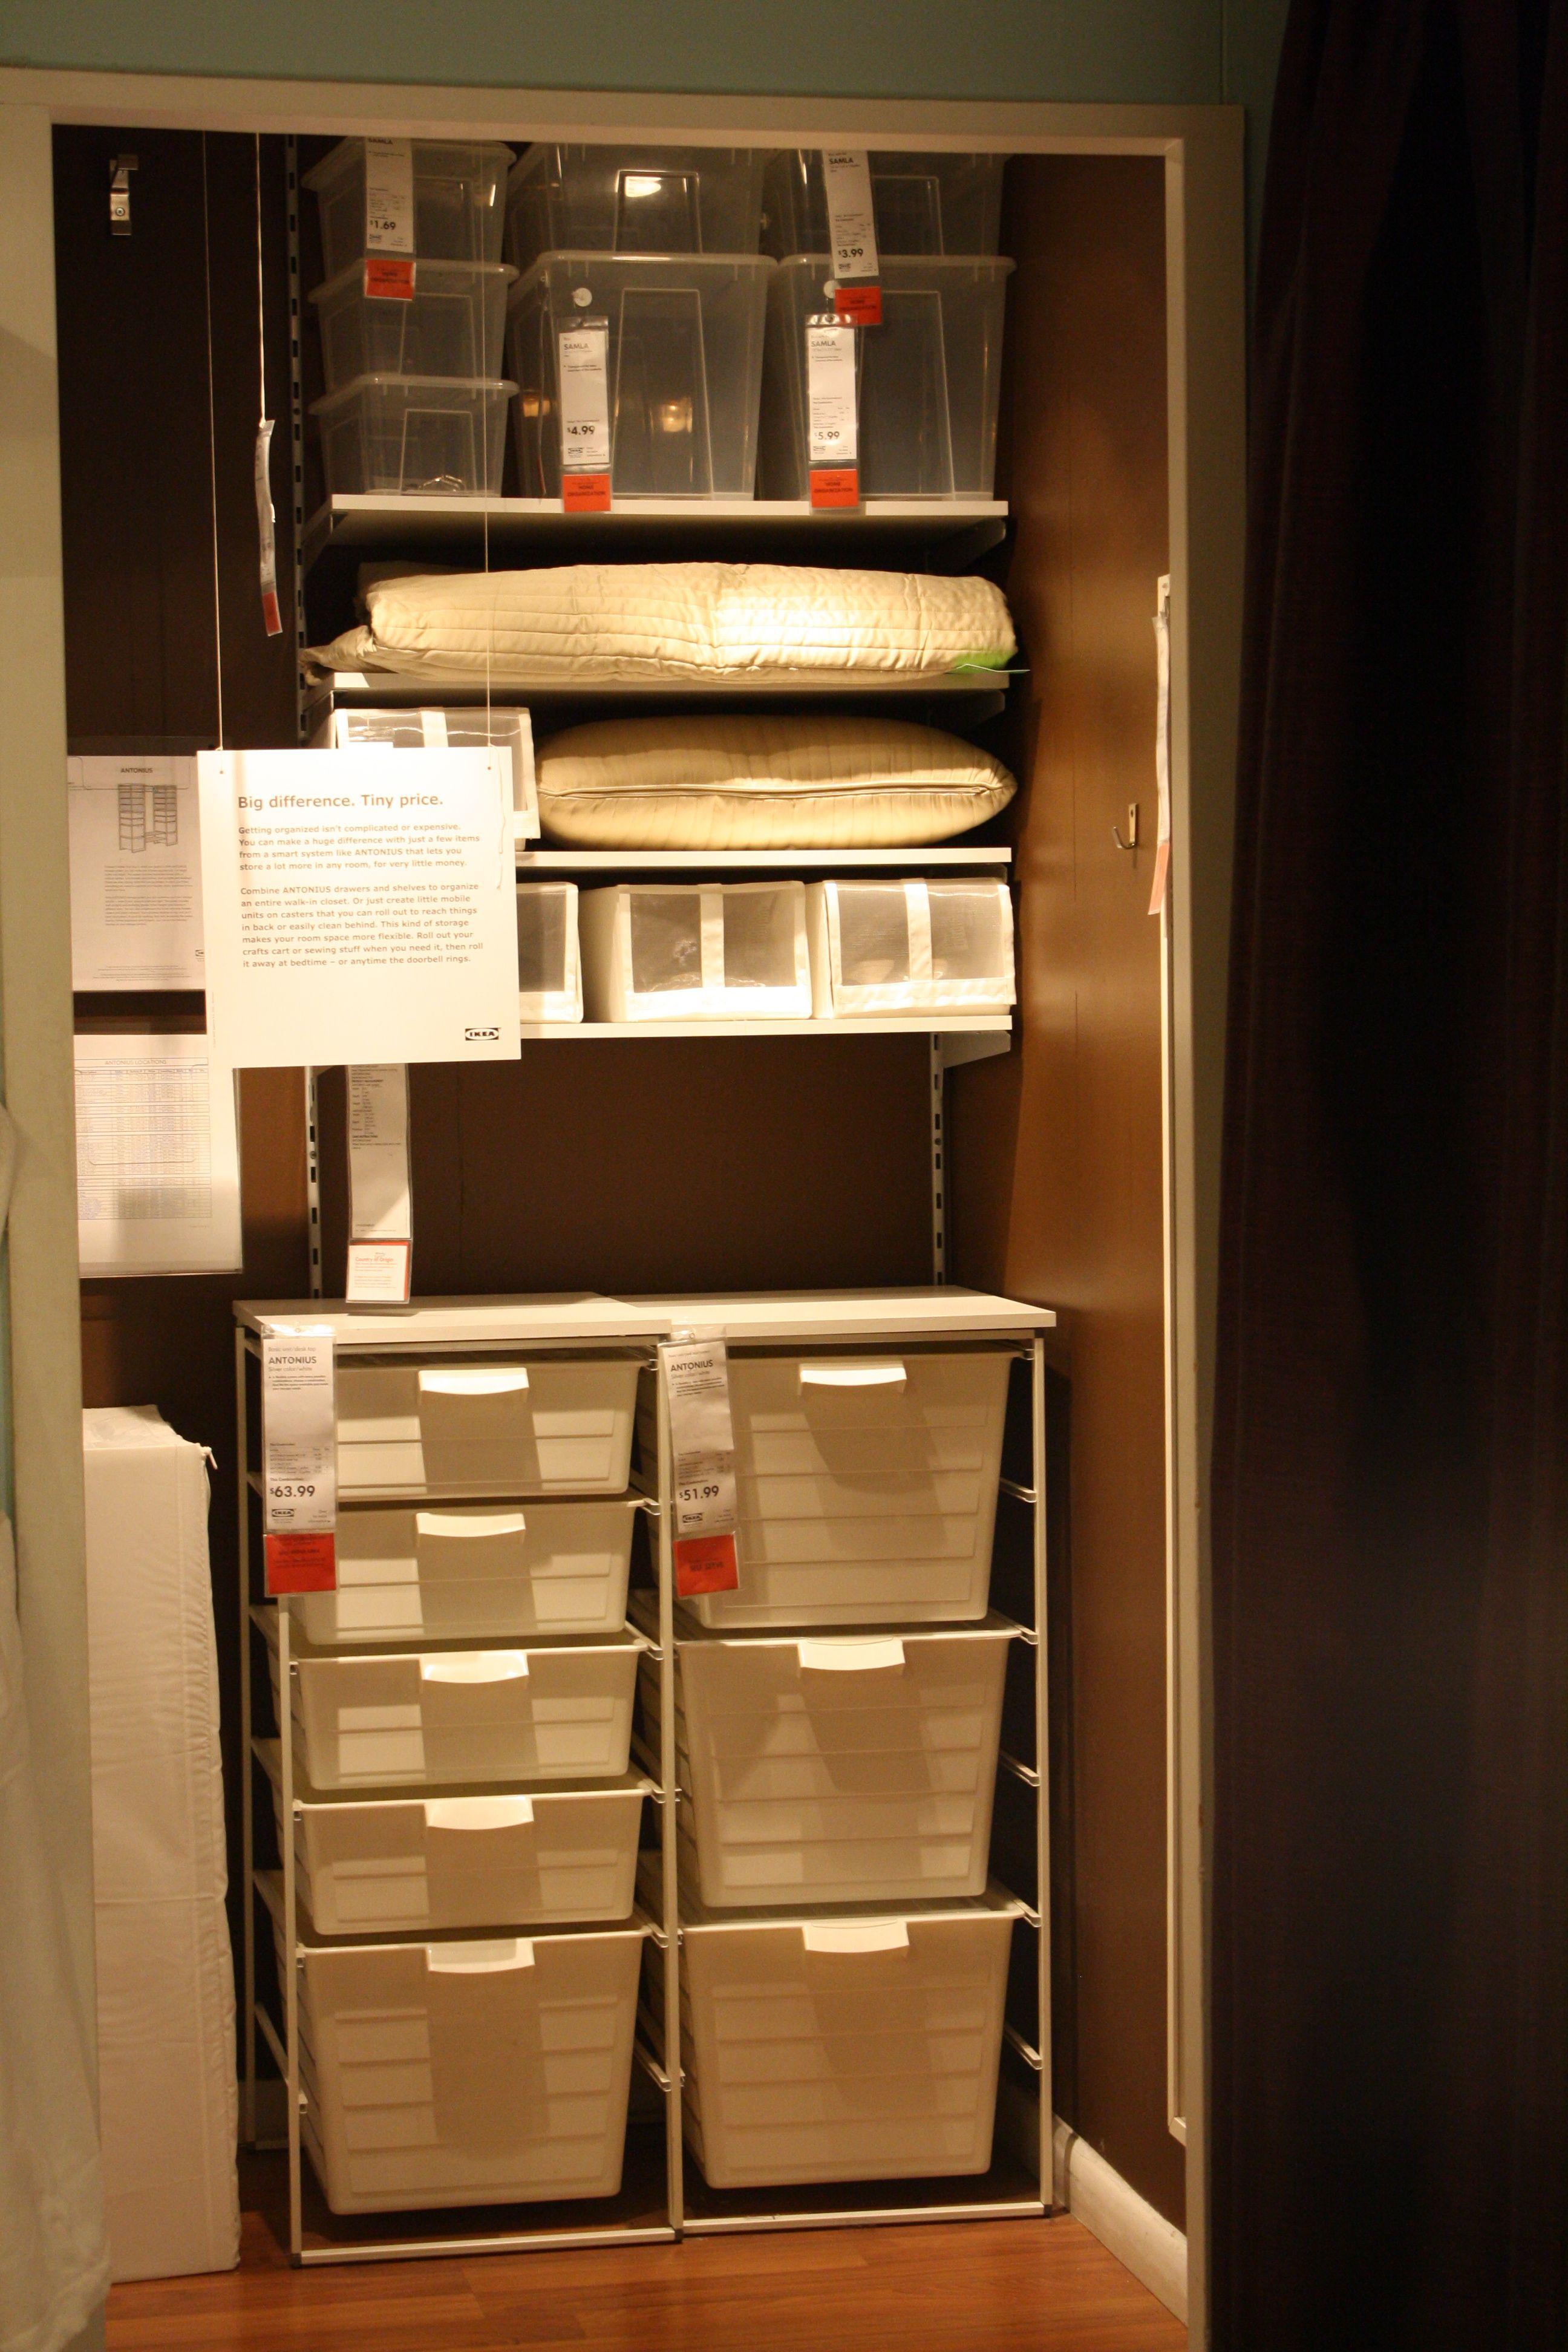 Ikea Kastinrichting Inloopkast Ideeën Inloopkast Ideeen